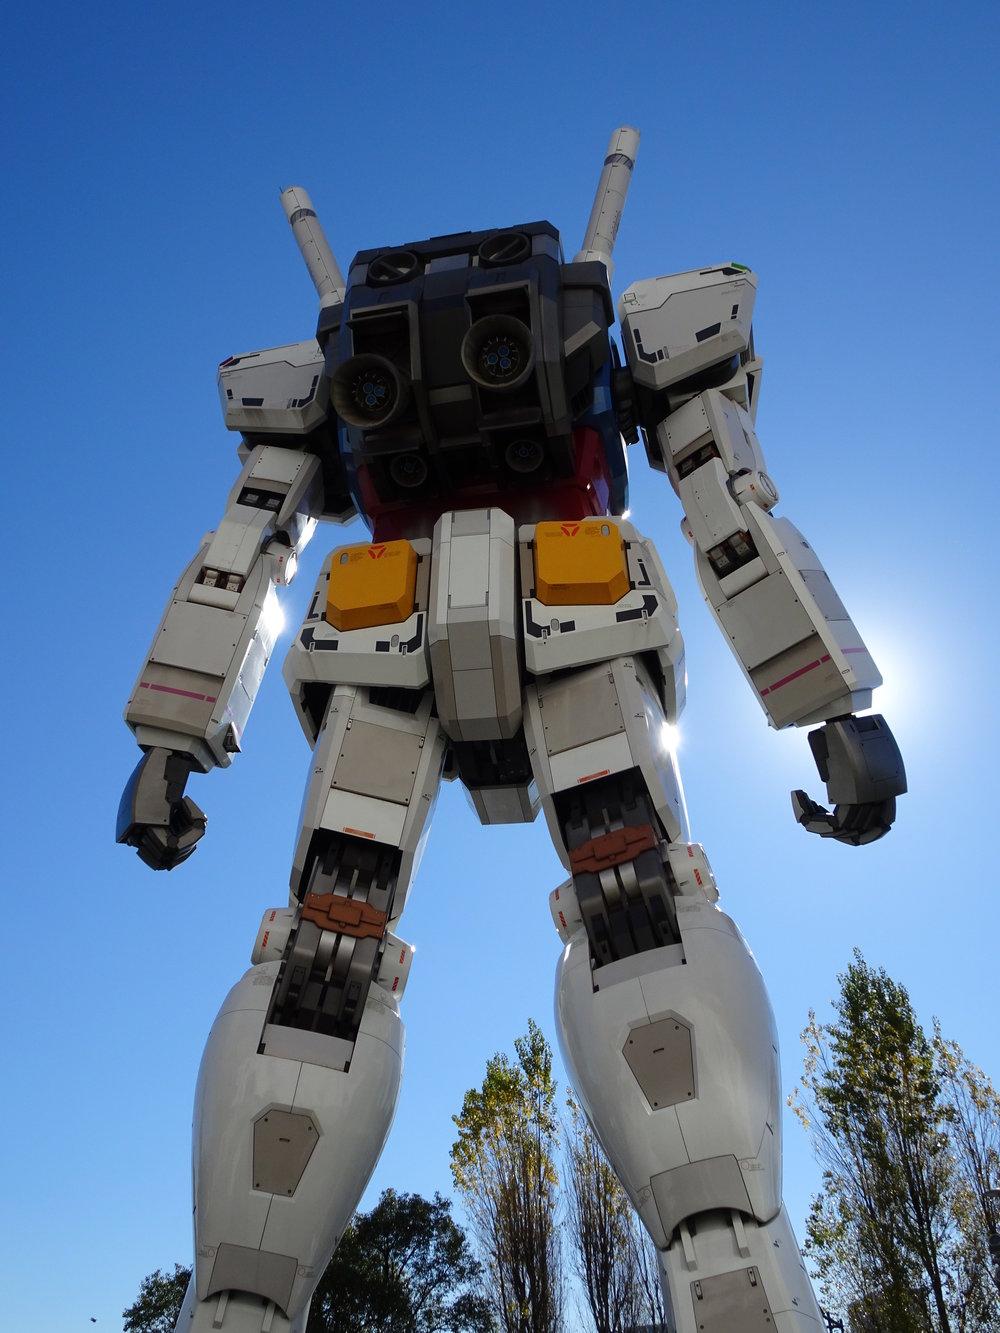 RX-78-2 Gundam 1-1 Statue - 045.jpg